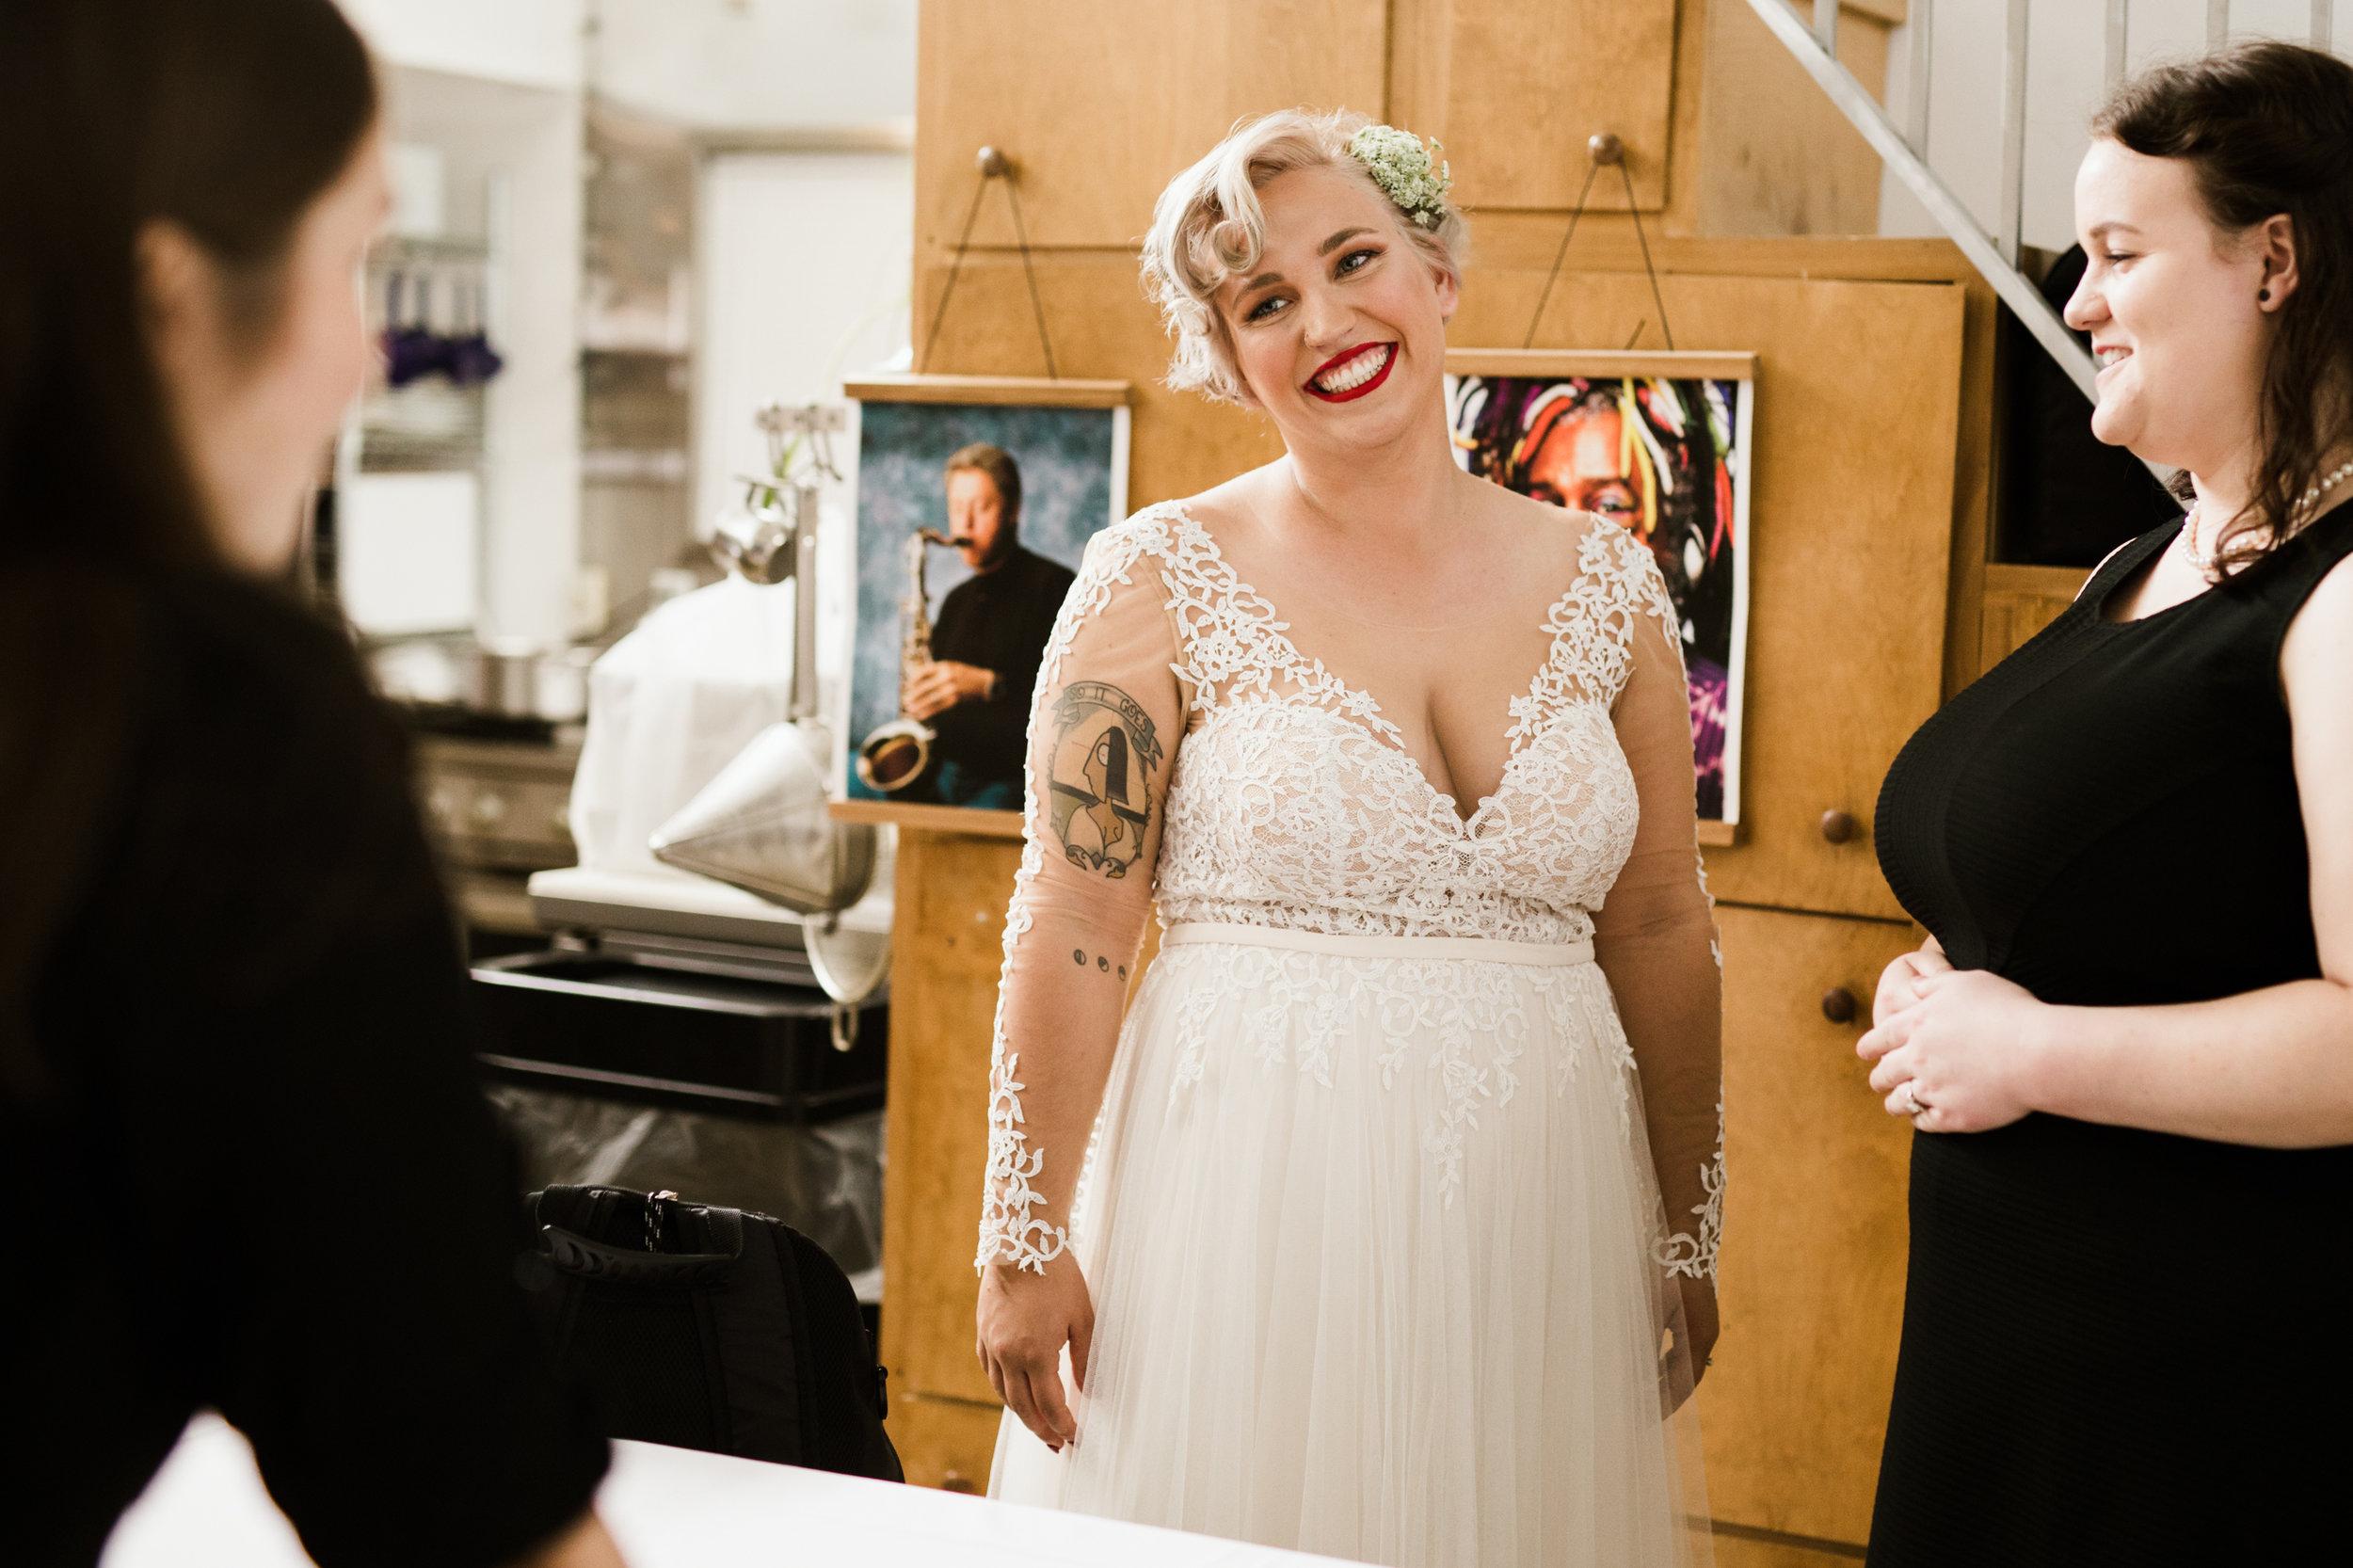 Kentucky Wedding Louisville Wedding Photographer 2018 Crystal Ludwick Photo Louisville Wedding Photographer Kentucky Wedding Photographer (22 of 105).jpg